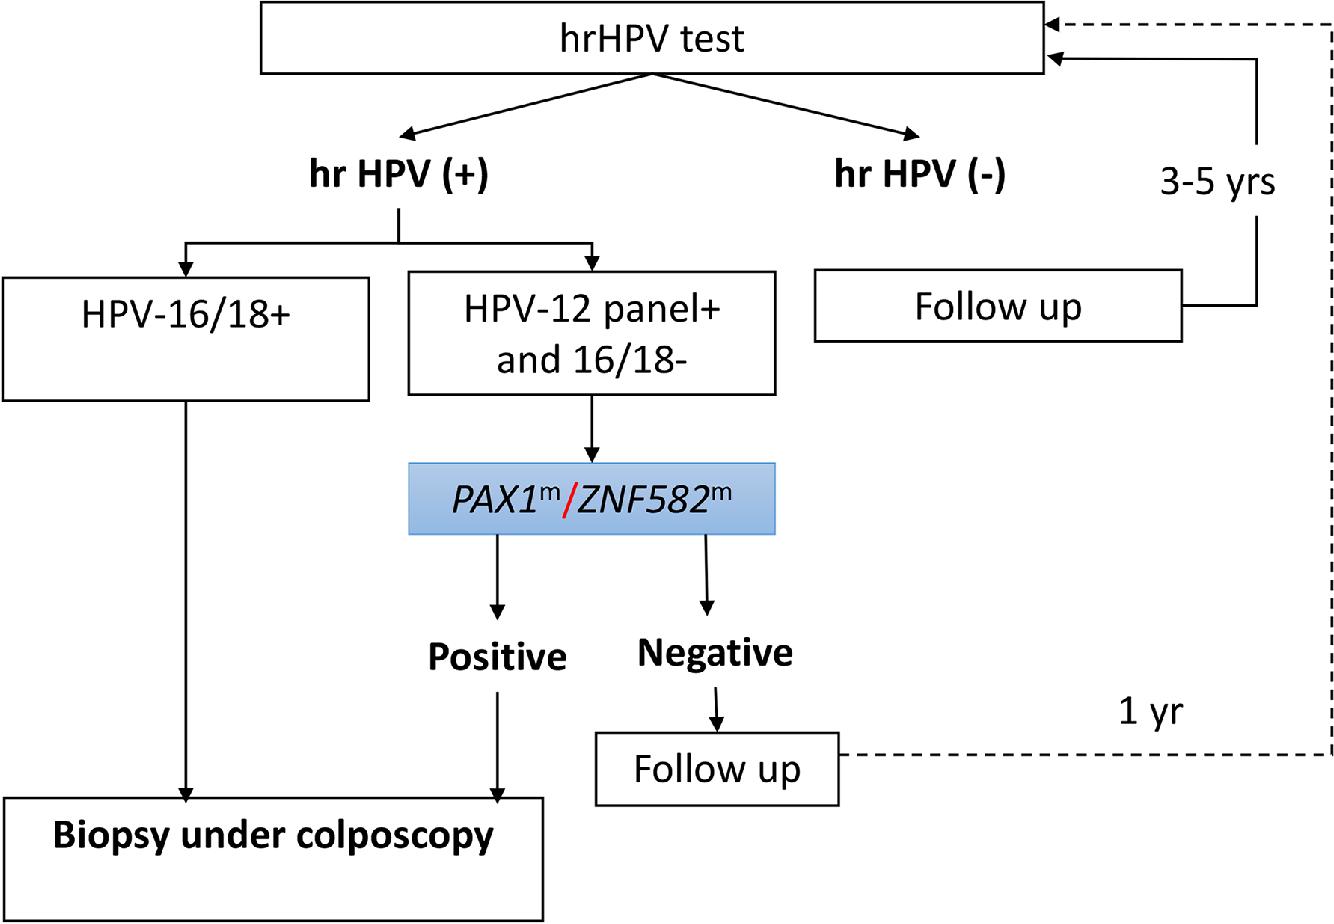 il papilloma virus e una malattia venerea